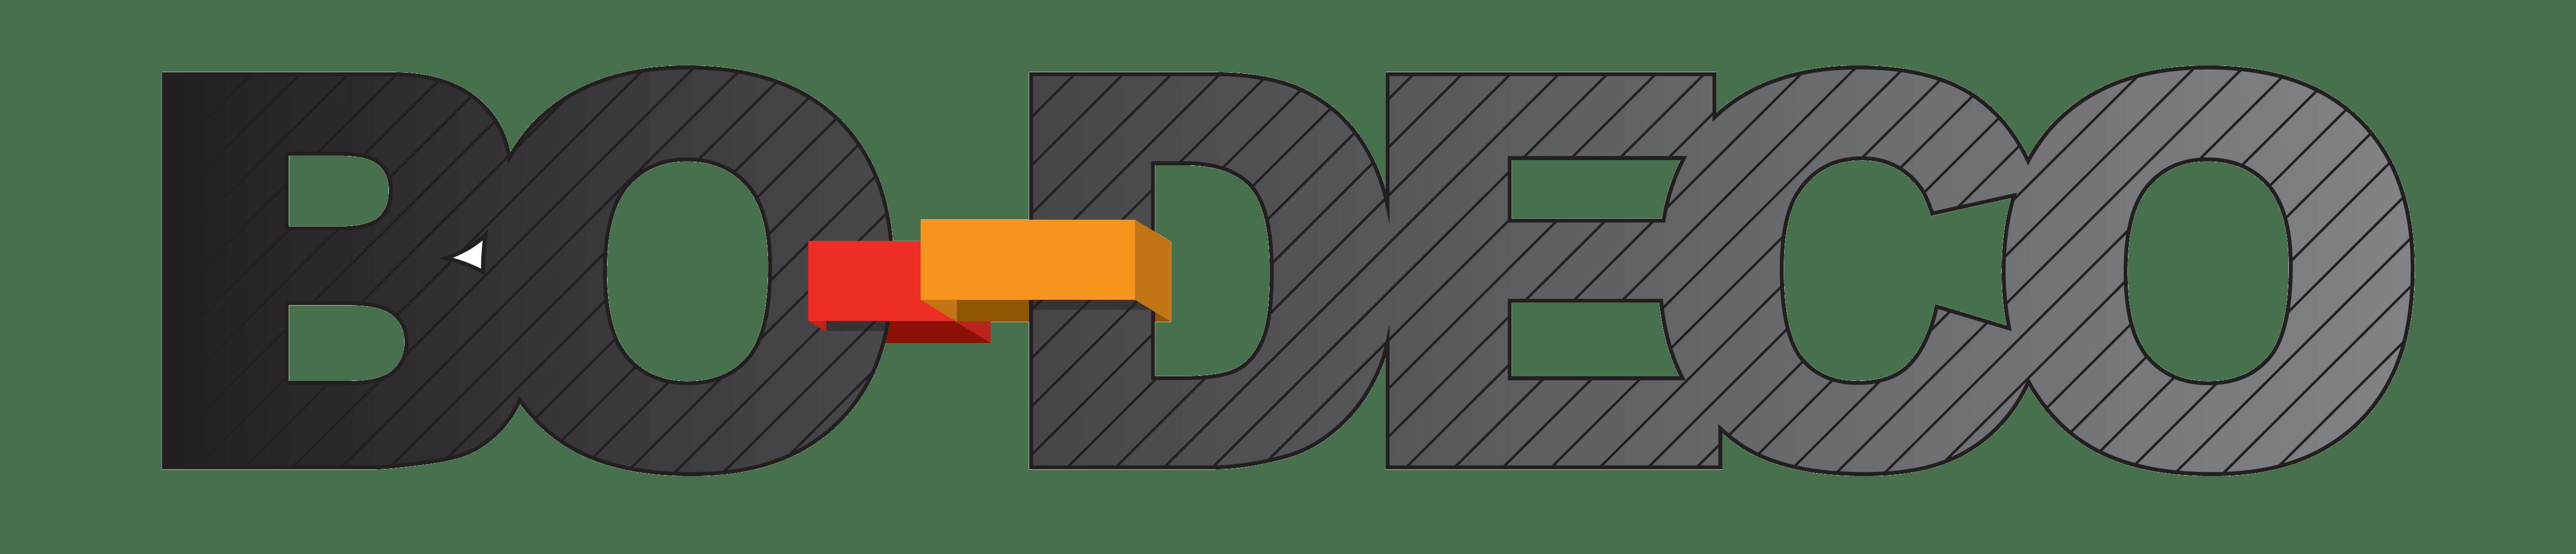 decologo-verviers